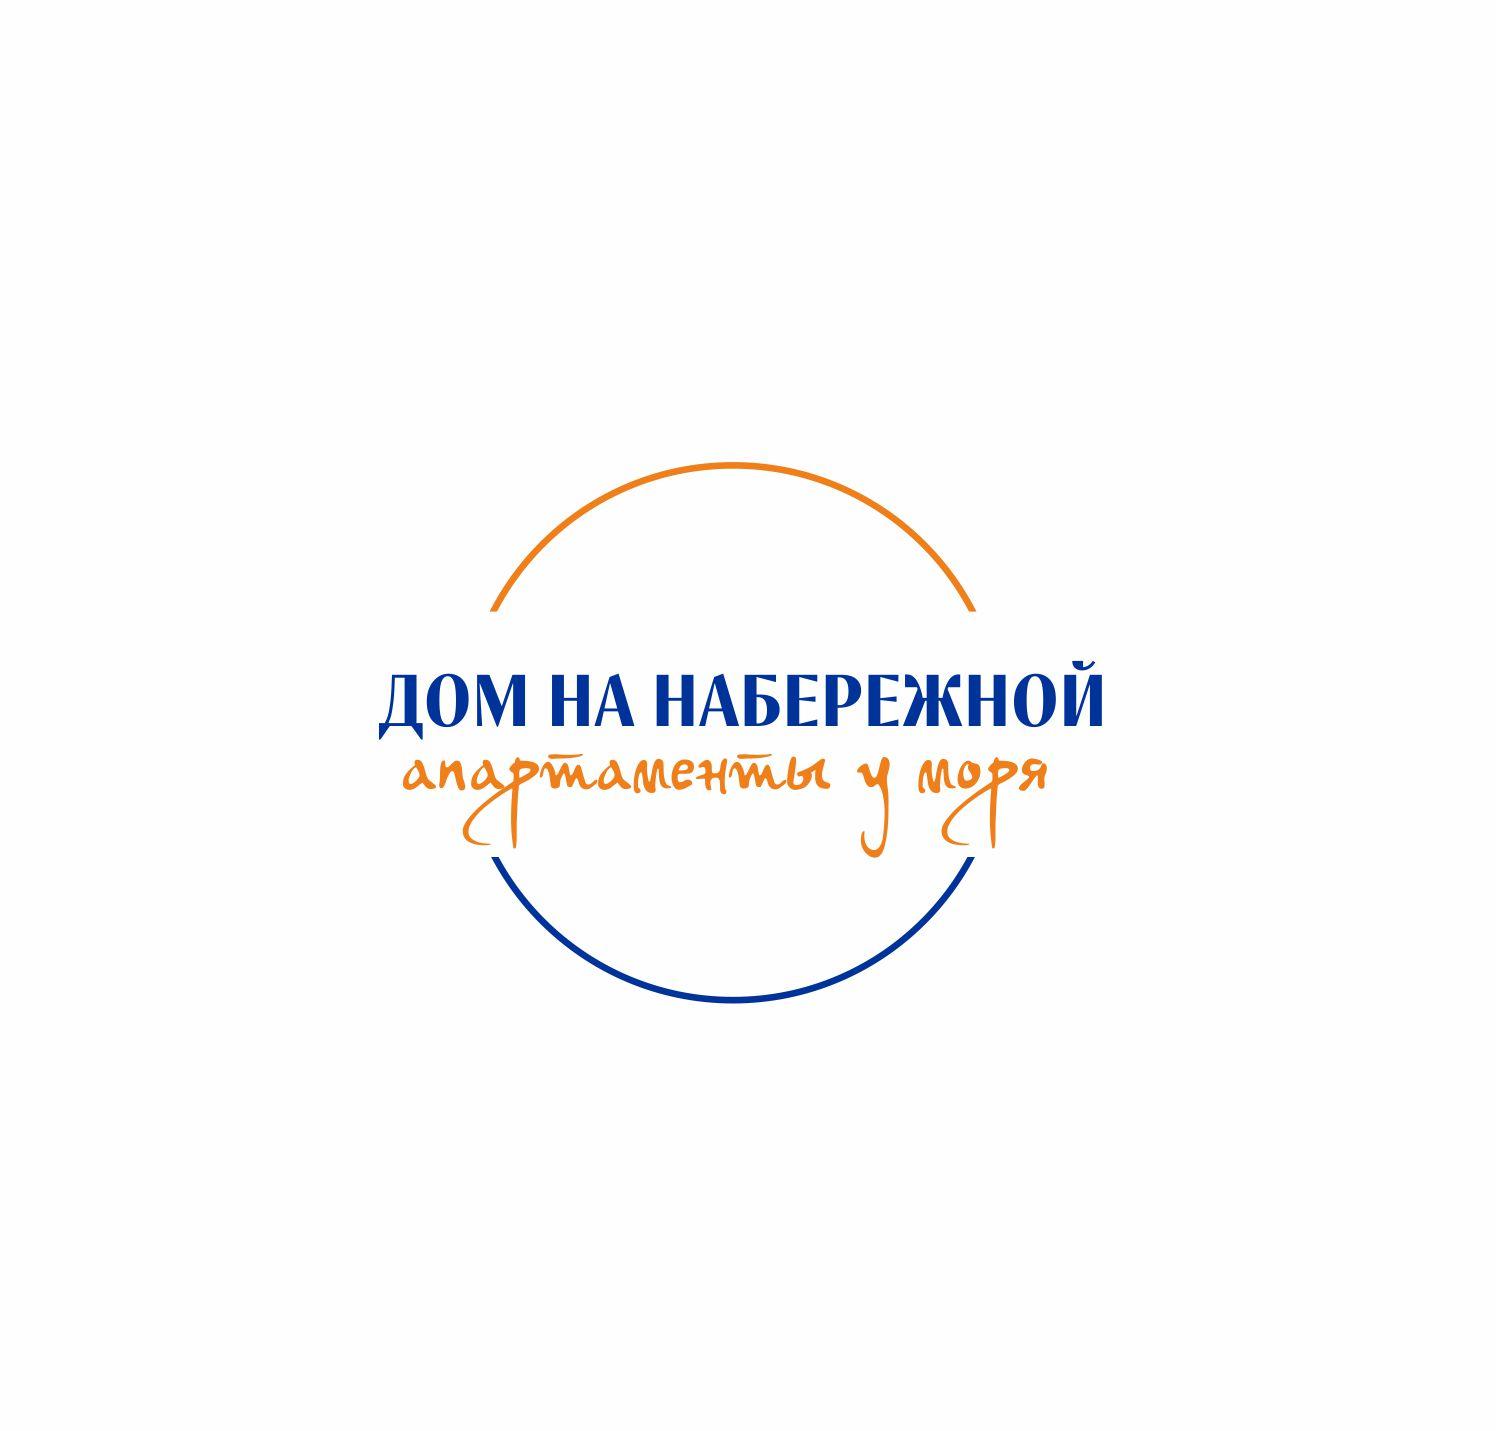 РАЗРАБОТКА логотипа для ЖИЛОГО КОМПЛЕКСА премиум В АНАПЕ.  фото f_4265de88bf069aa0.jpg